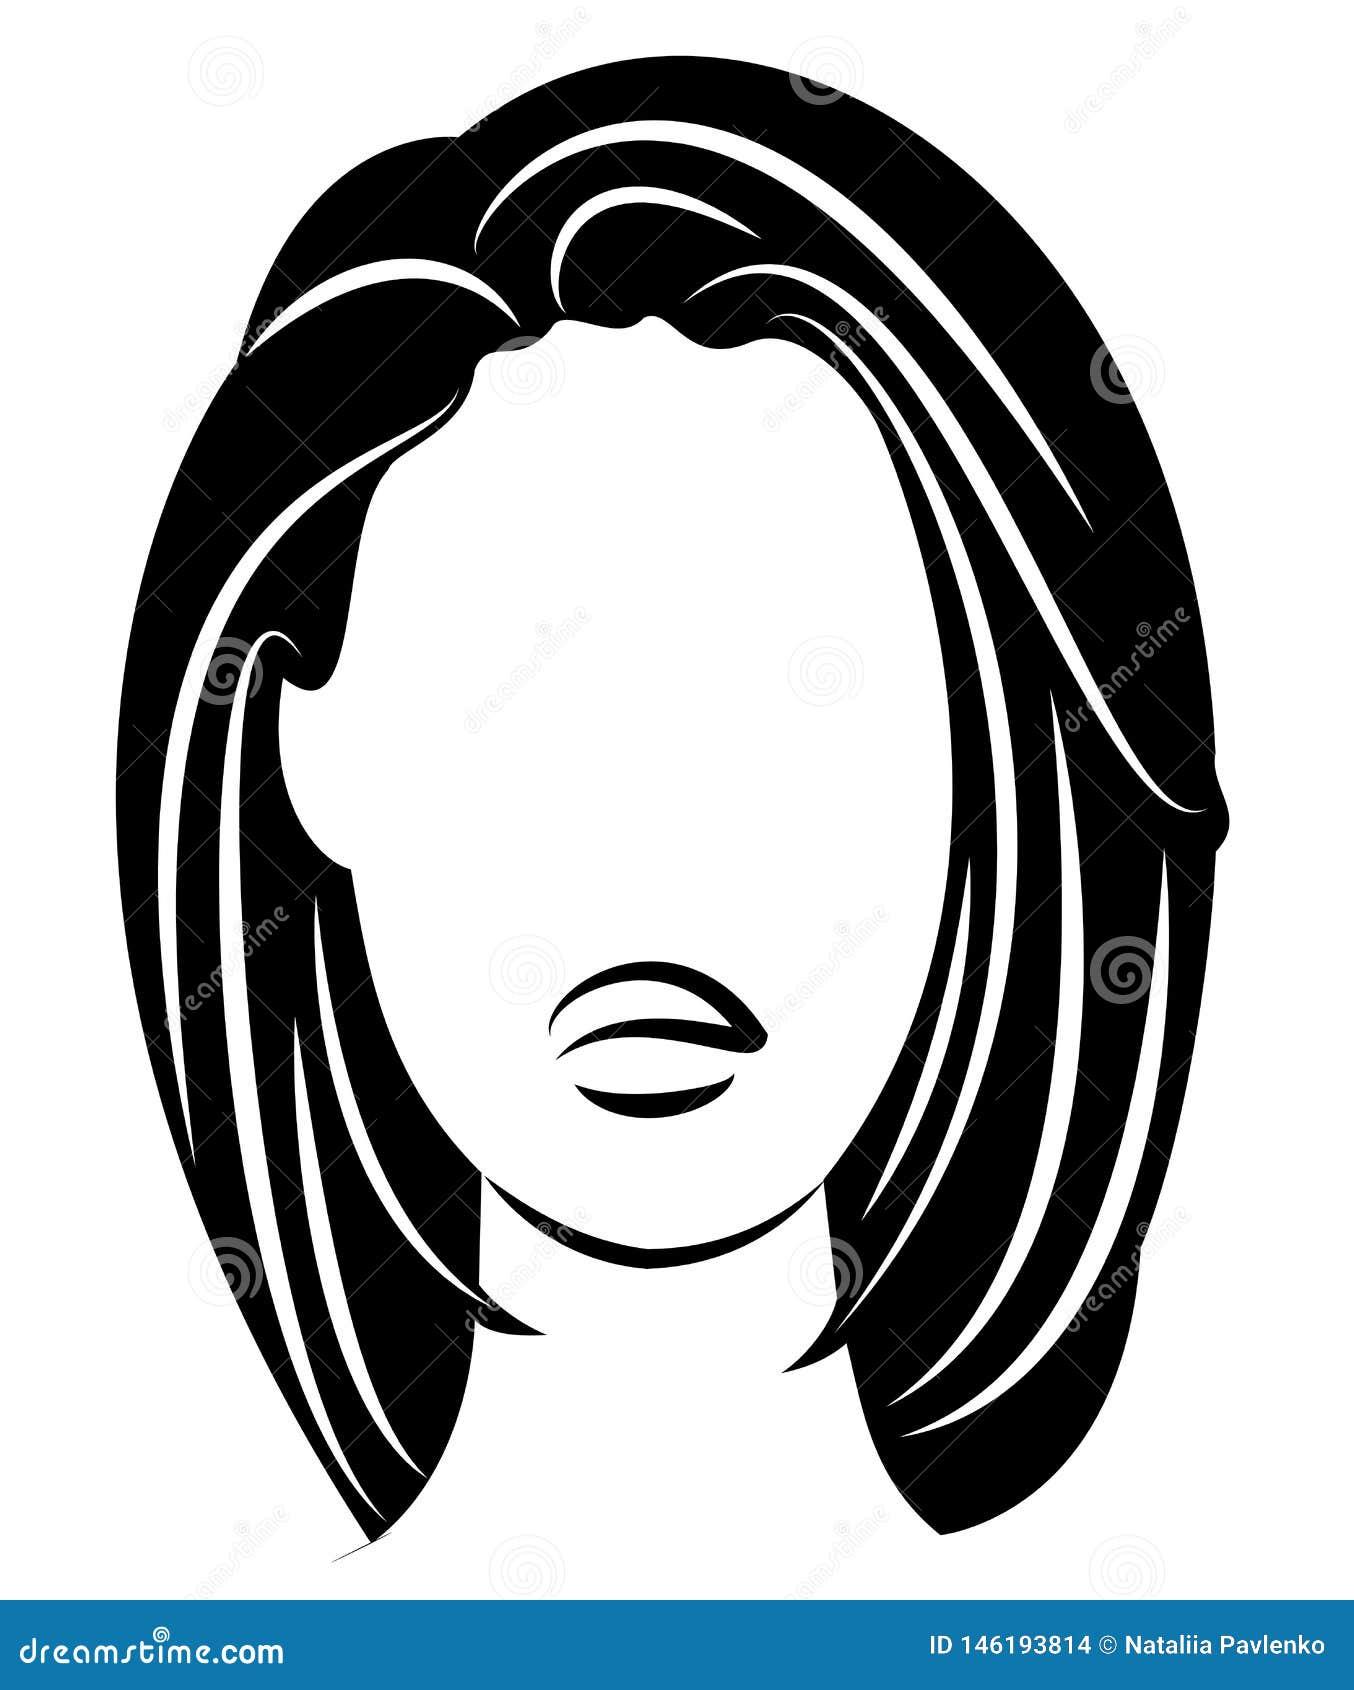 Siluetta di una testa di una signora dolce Una ragazza mostra un acconciatura di una donna su capelli medi e lunghi Adatto a logo